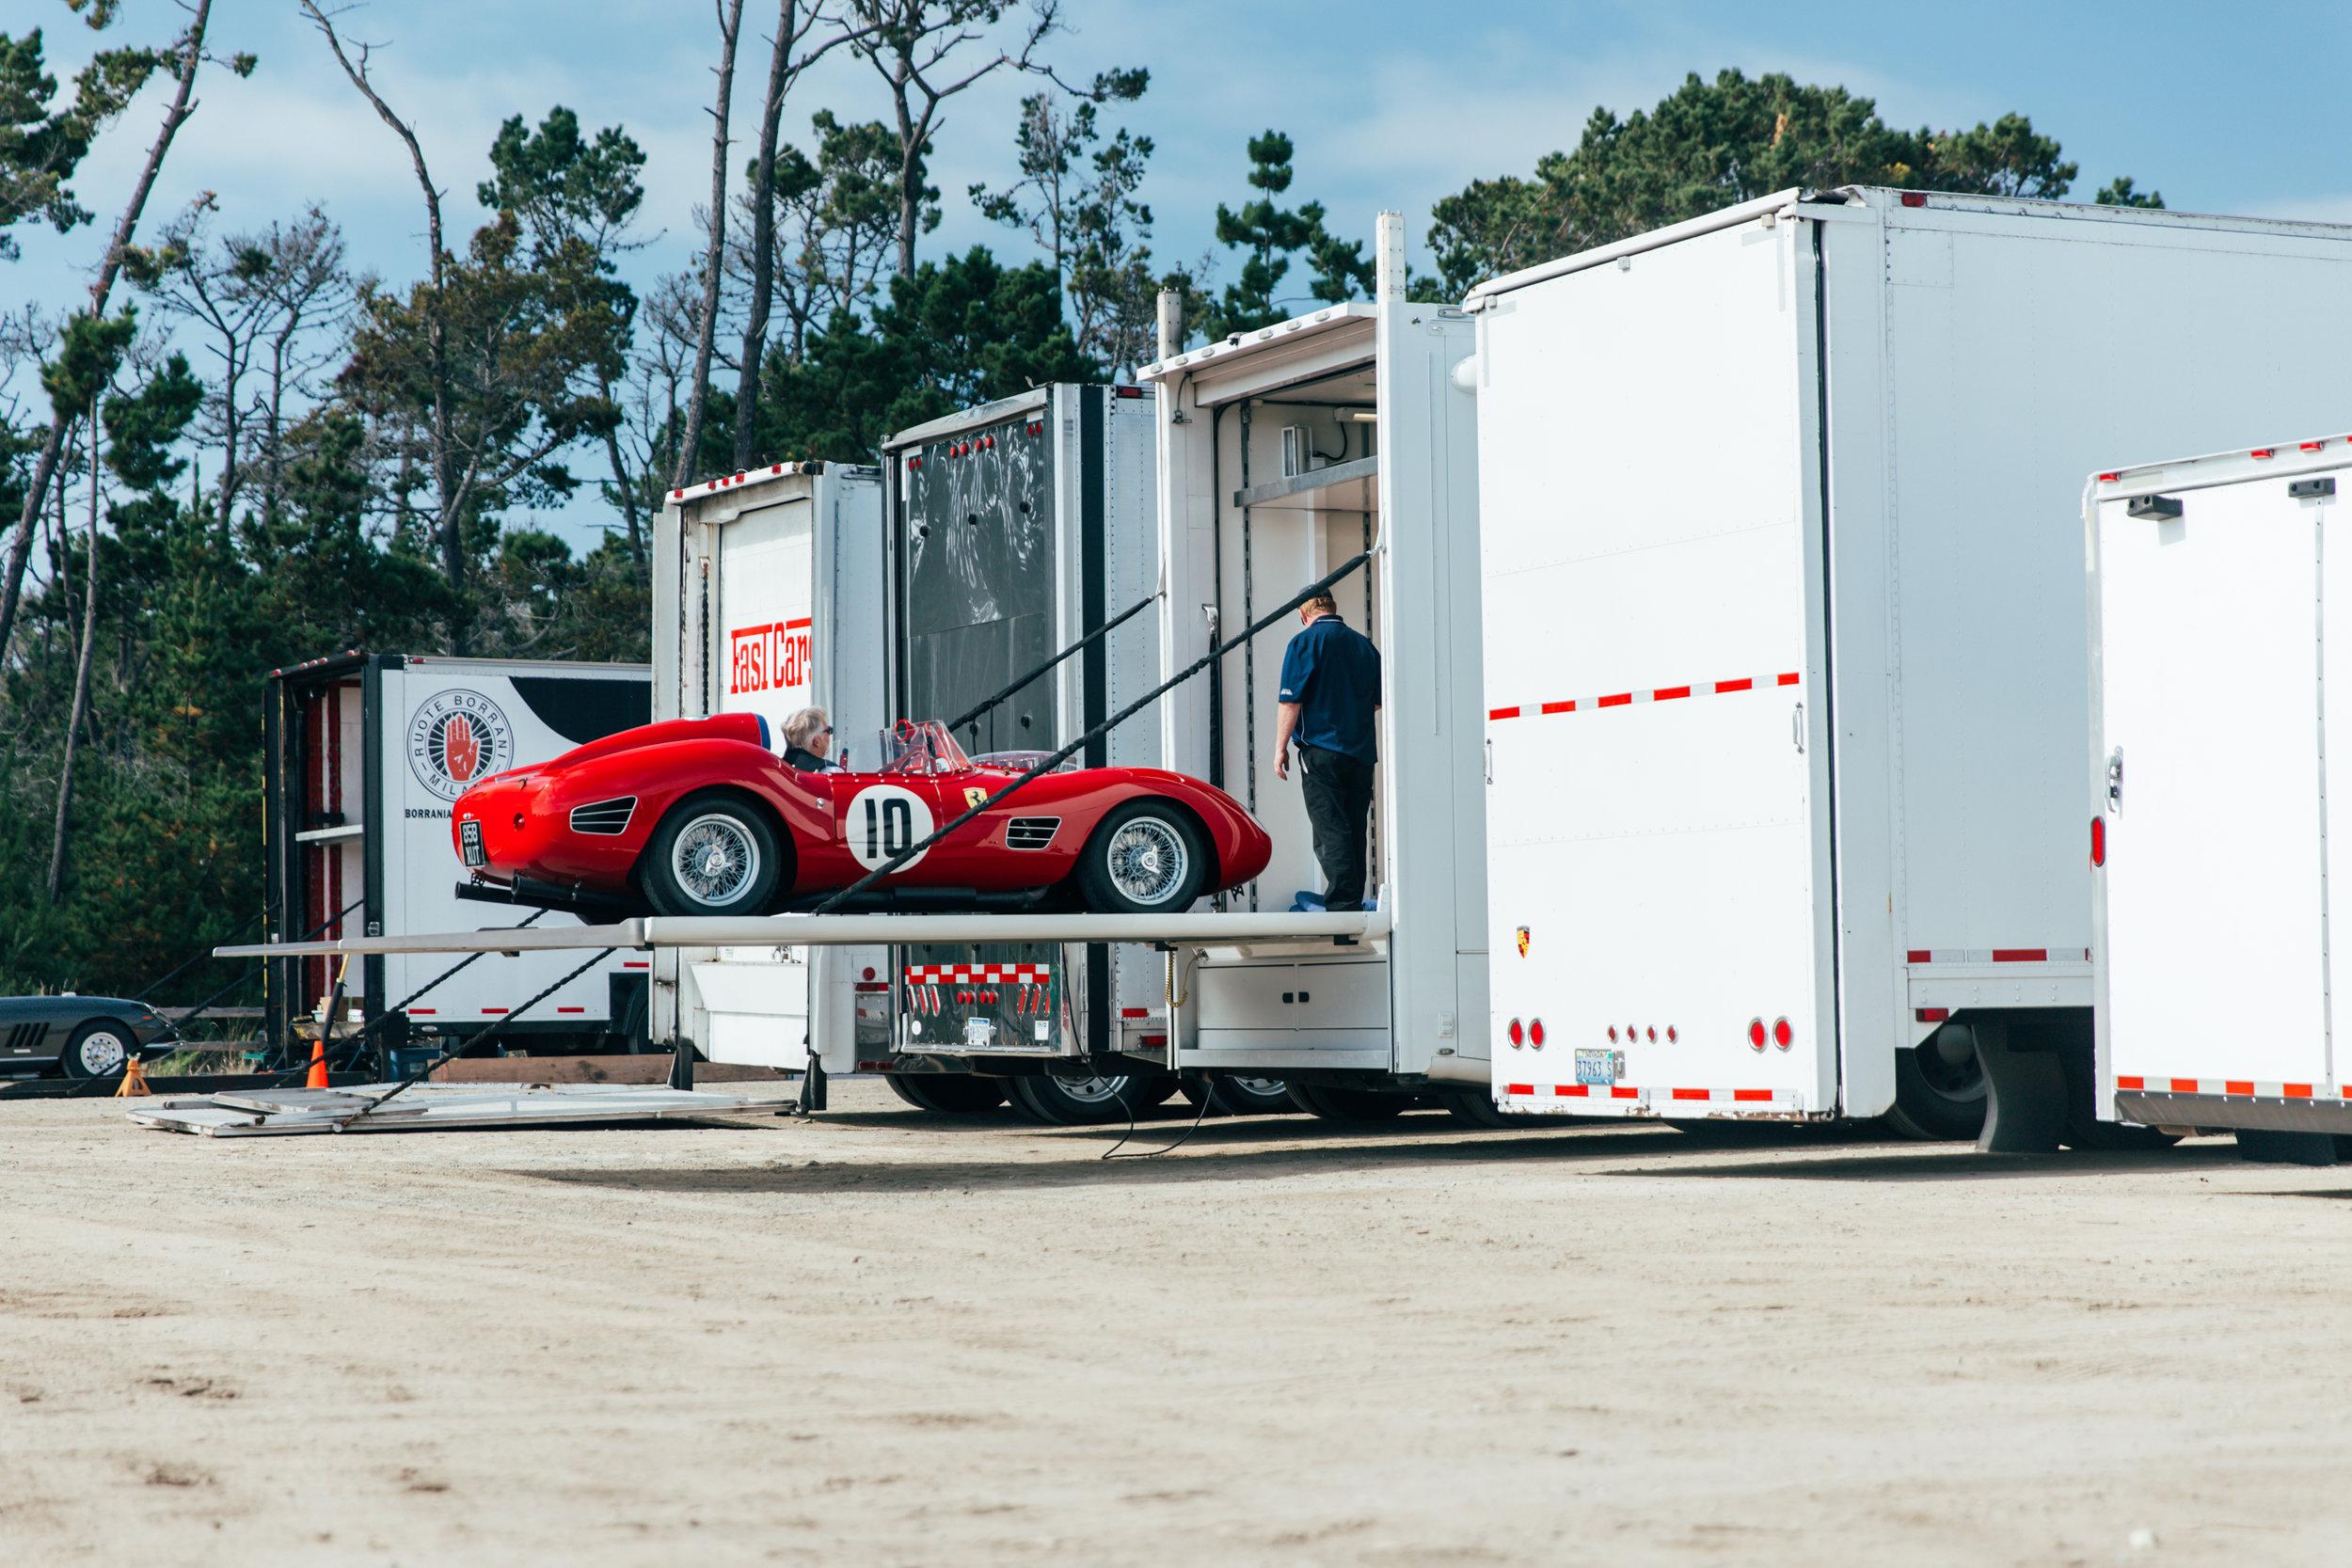 Stay_Driven_Monterey_Car_Week_1-21.jpg